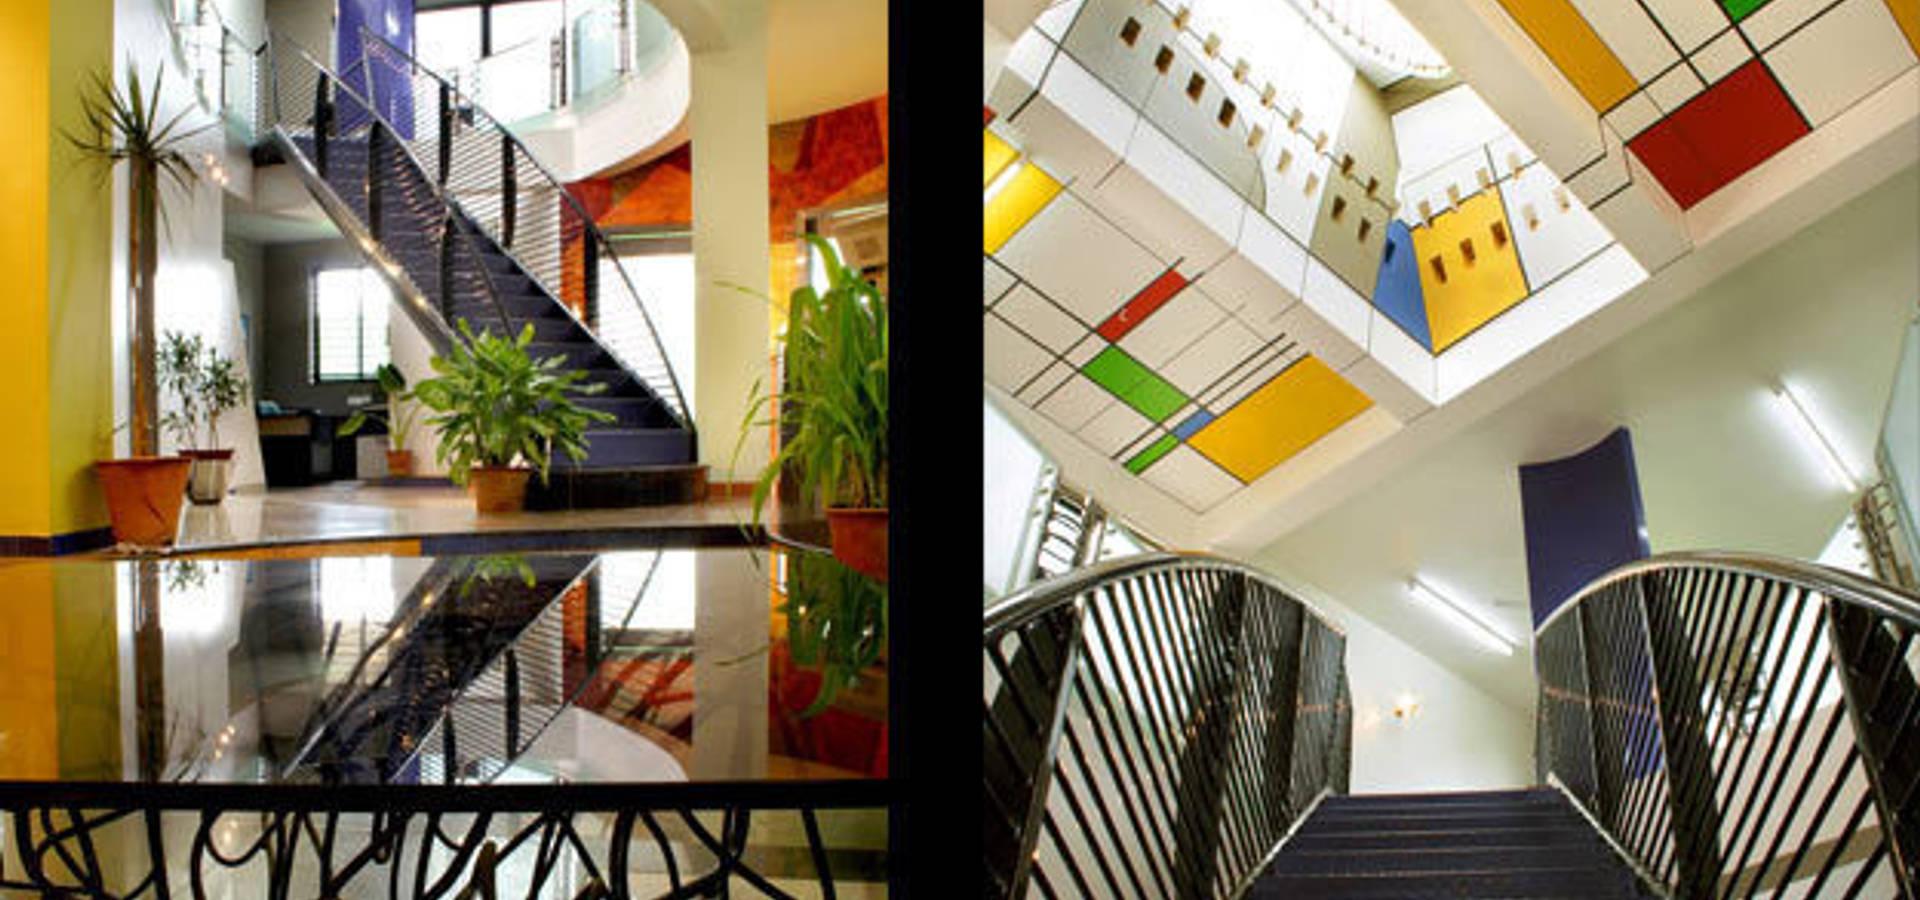 Kembhavi Architecture Foundation